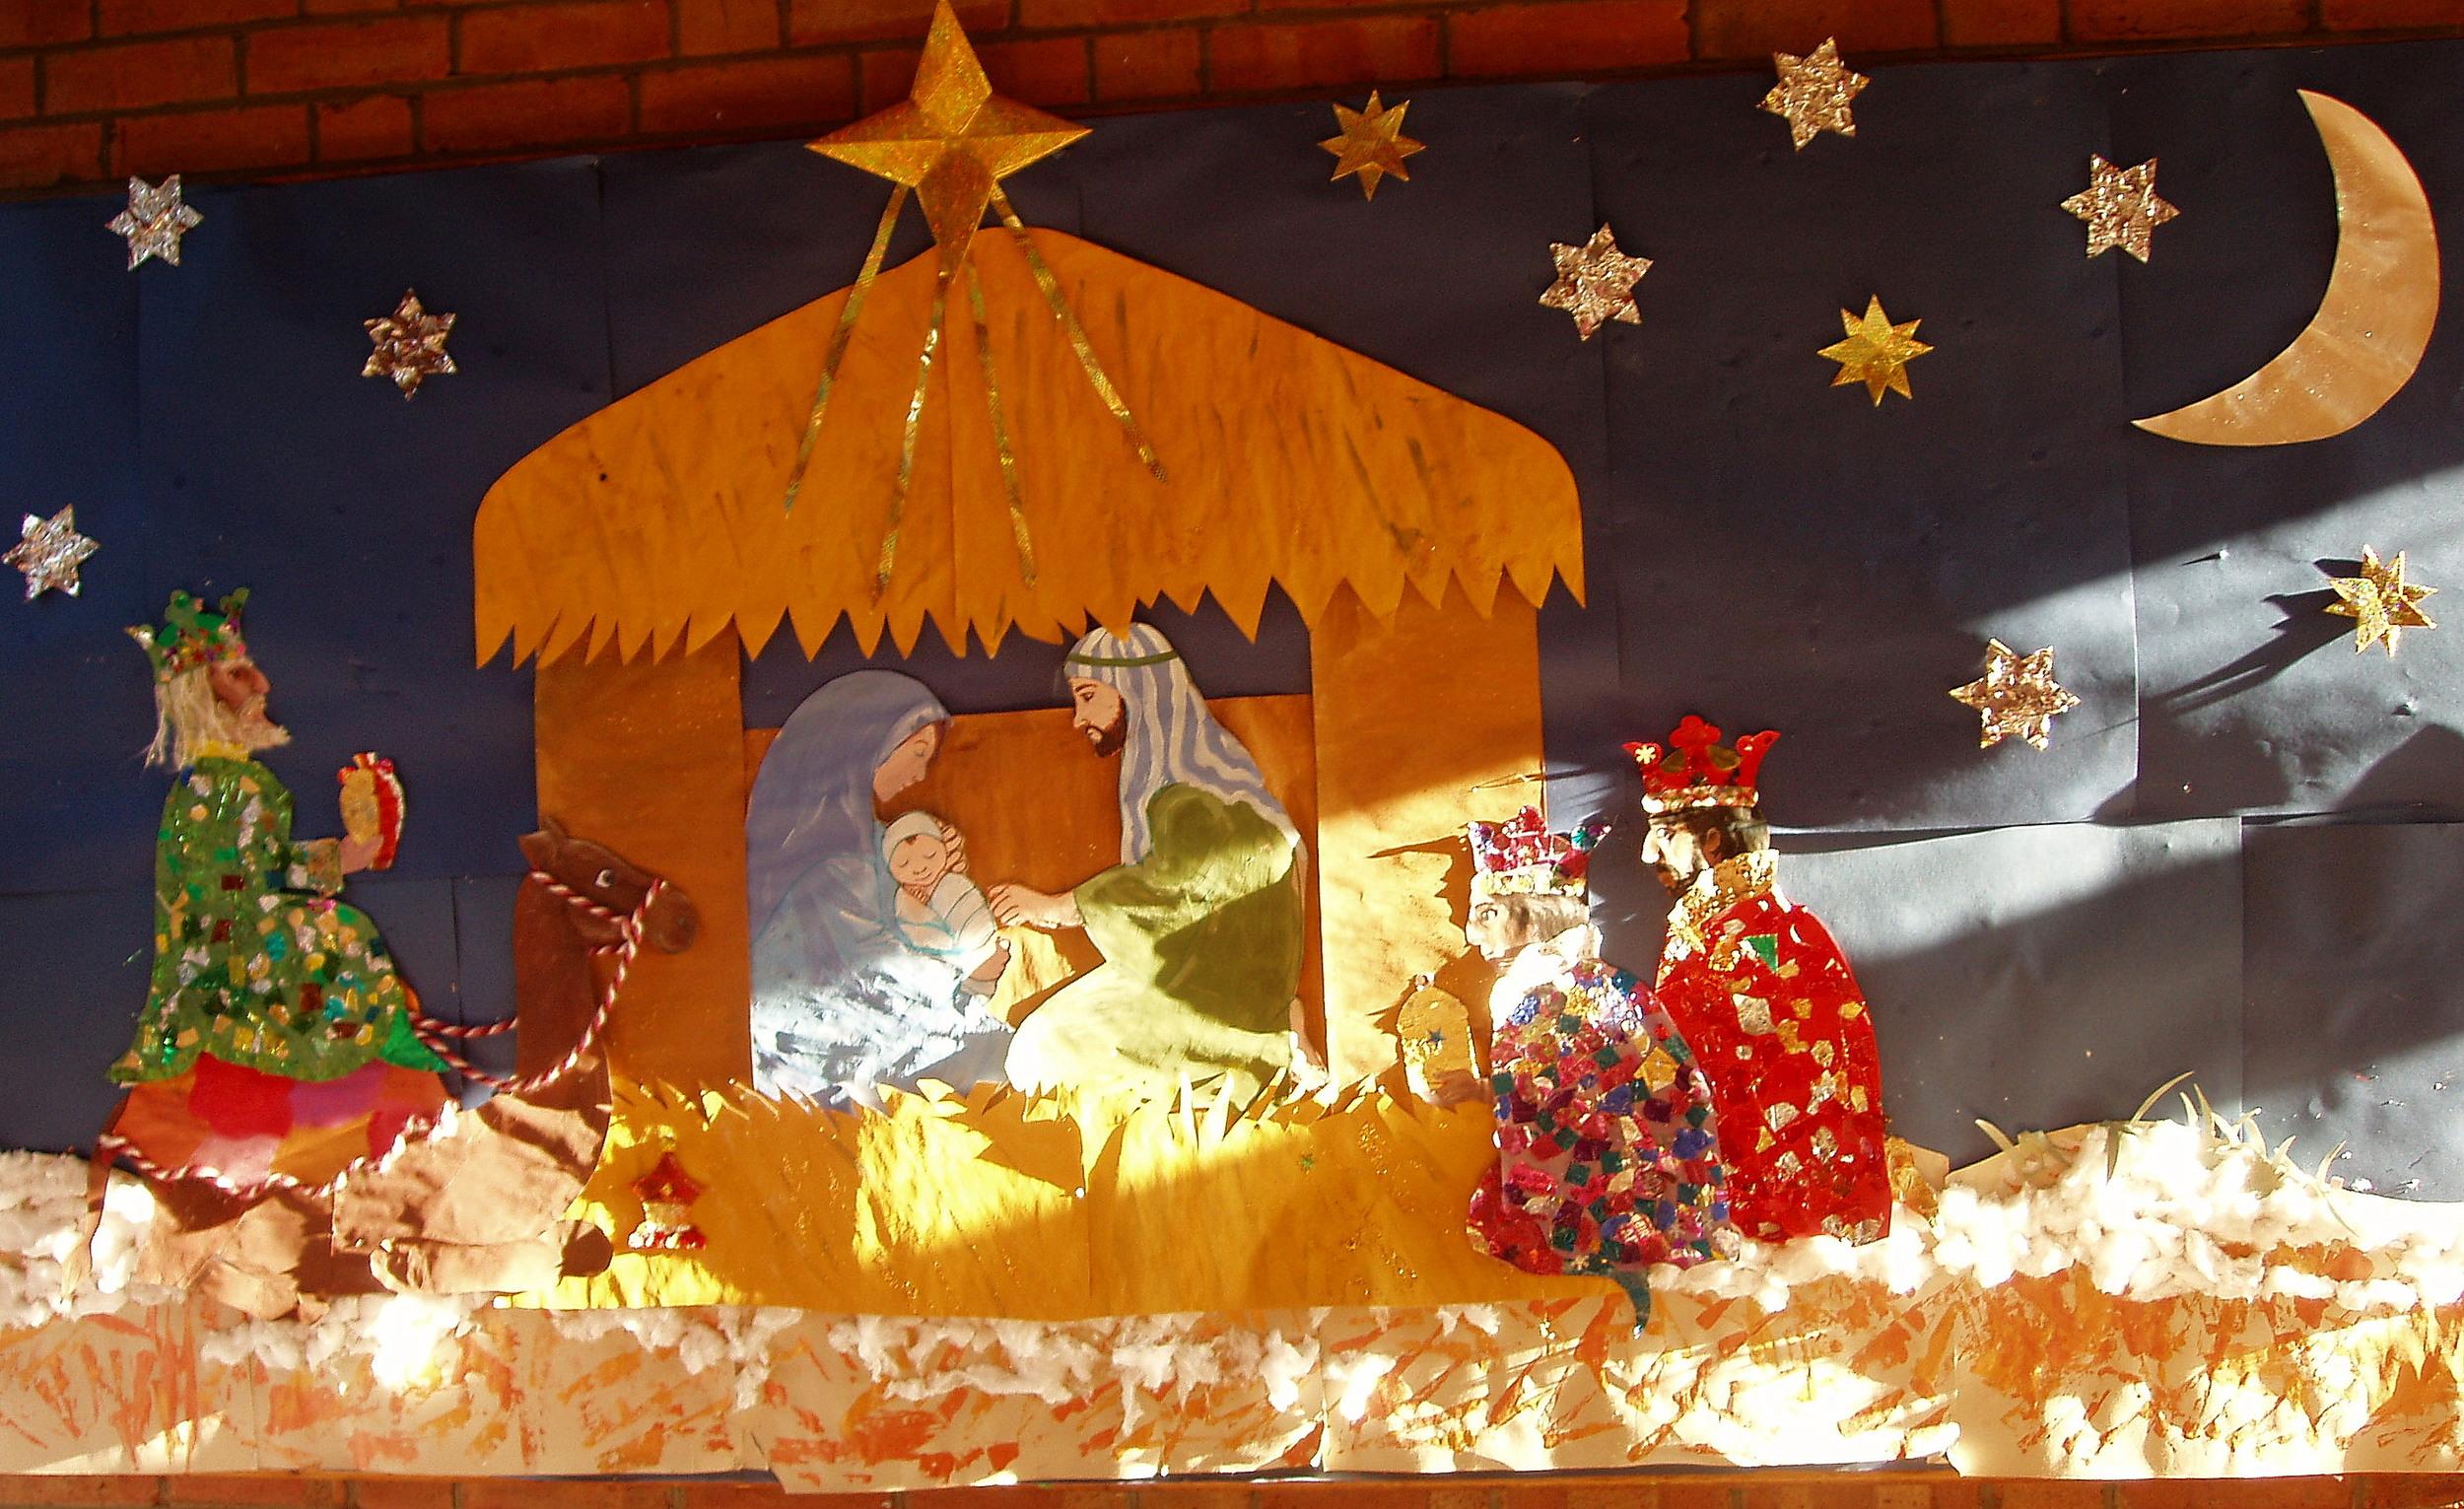 nativity display.JPG